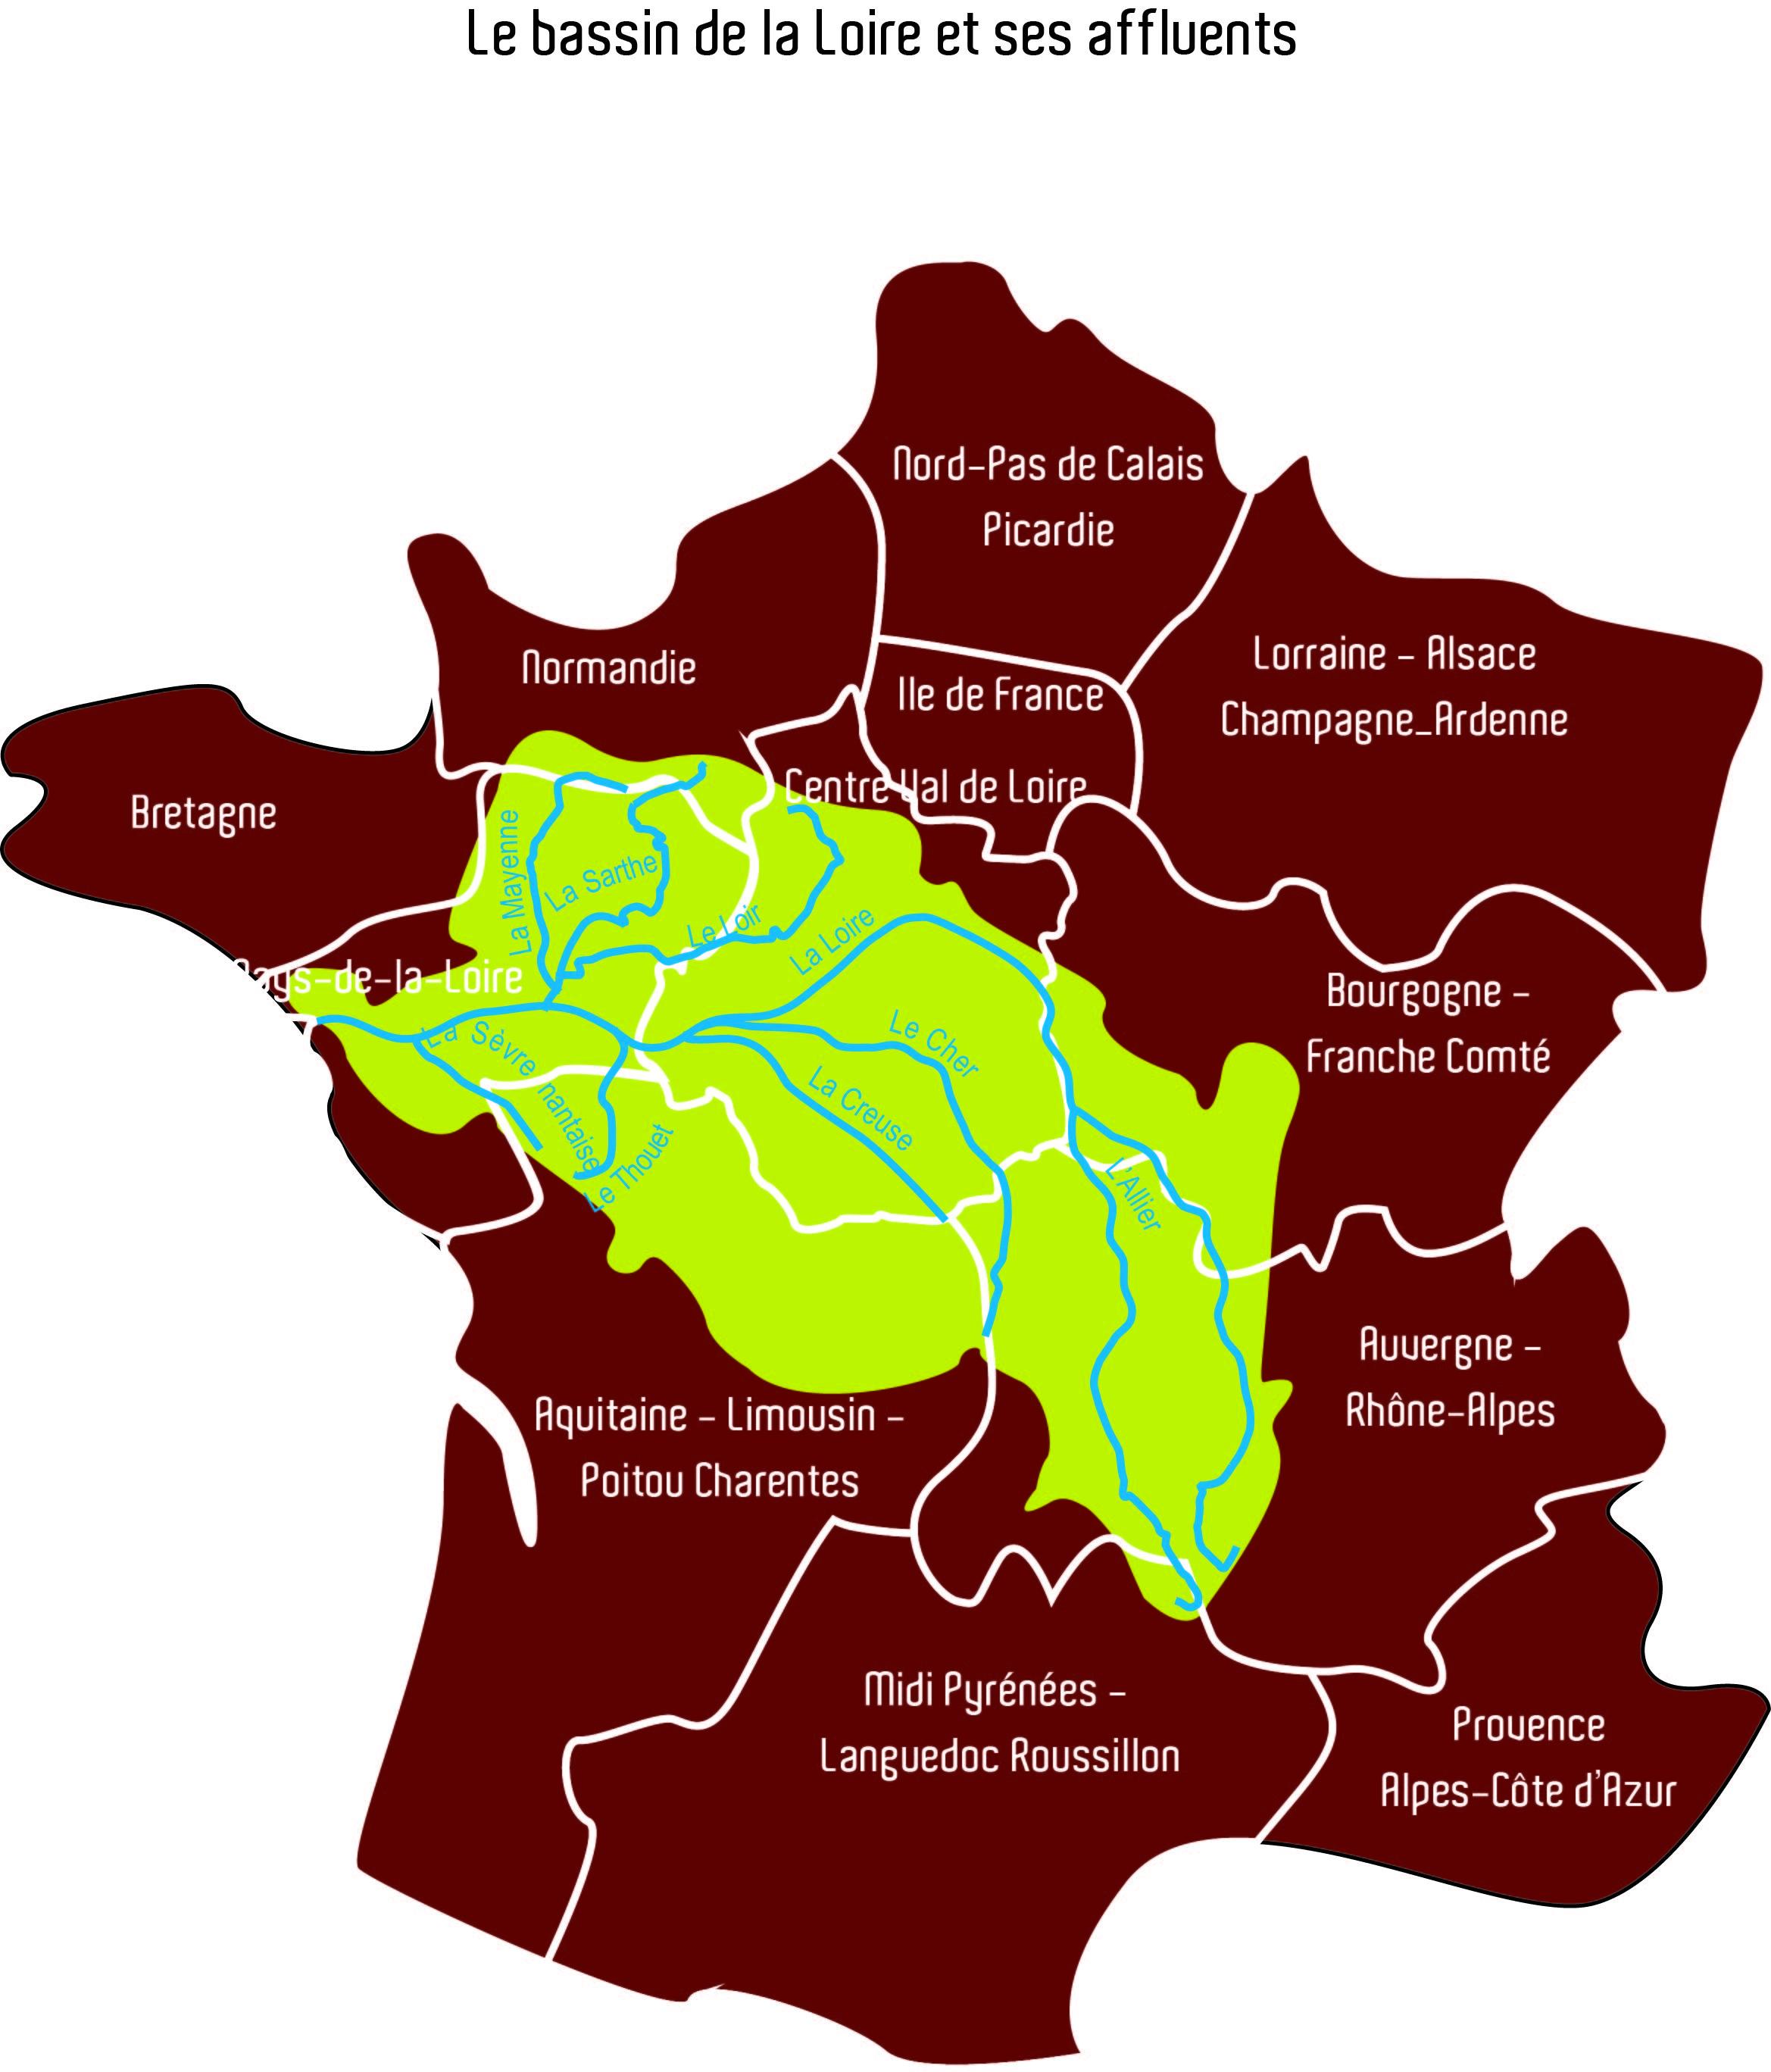 BassinLoire_France&Regions